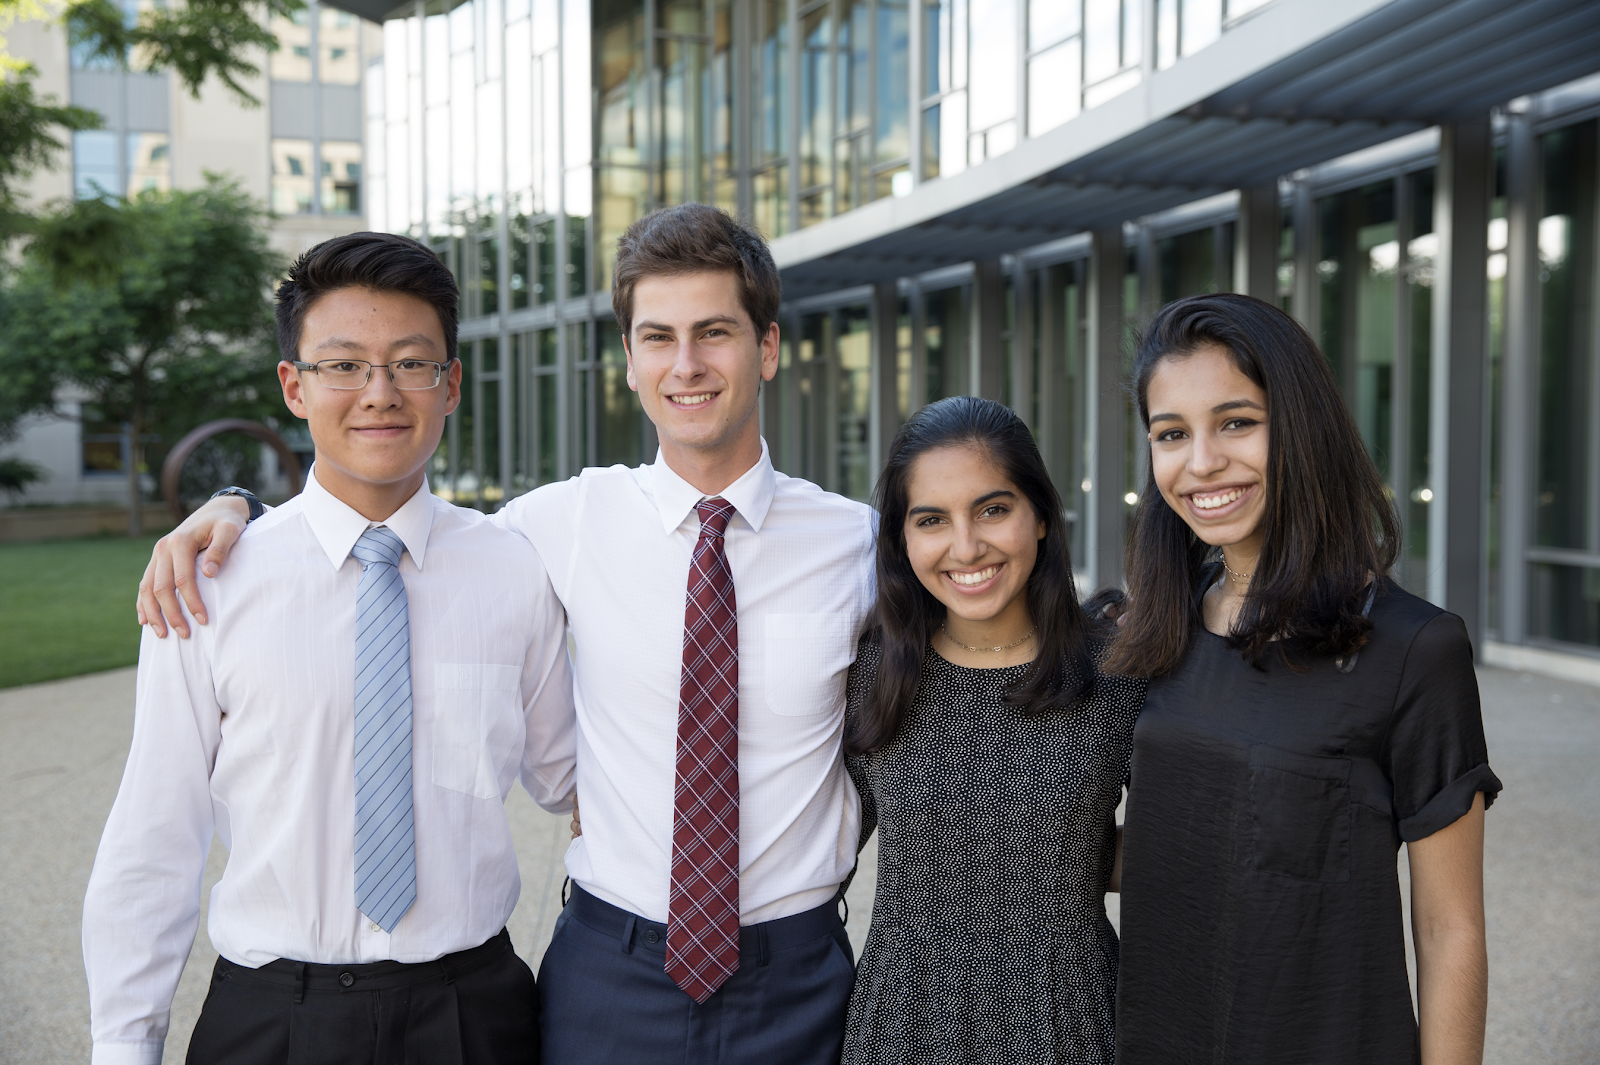 Juku Services 3D printing company, a team of high school entrepreneurs